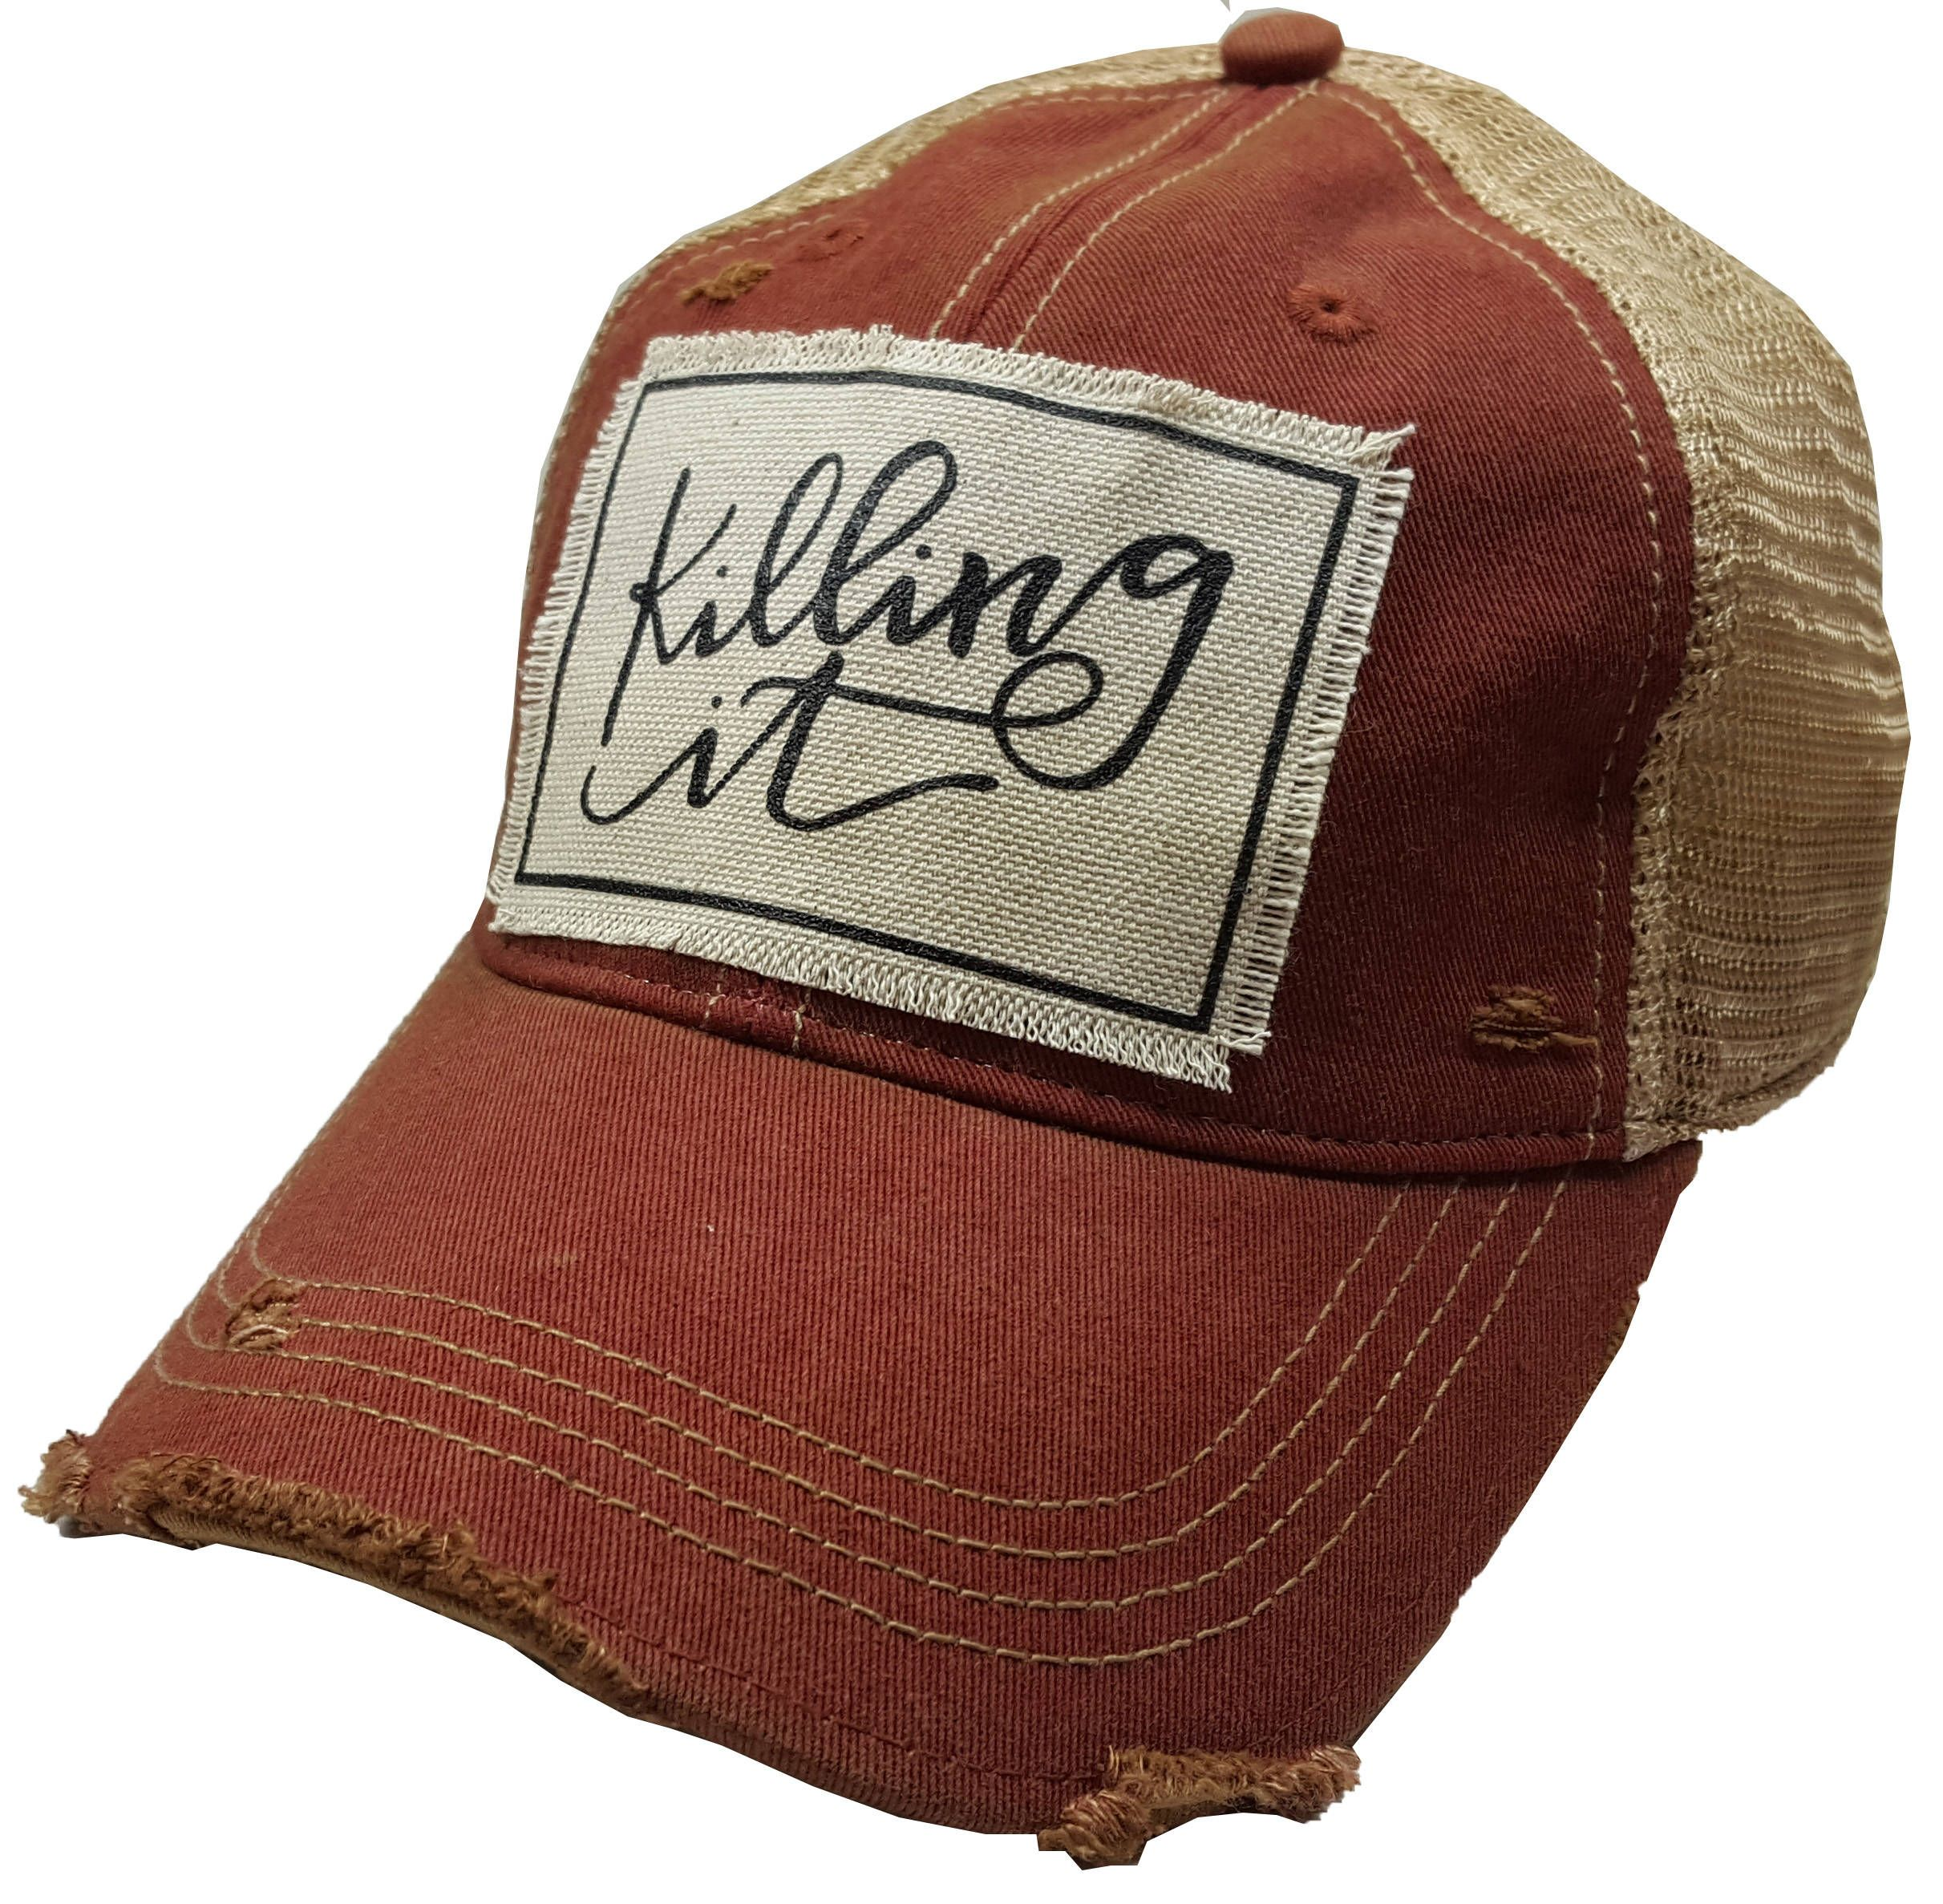 Unisex Low Profile Cowboy Hats One Size Sports Gym Baseball Cap Snapback Hat